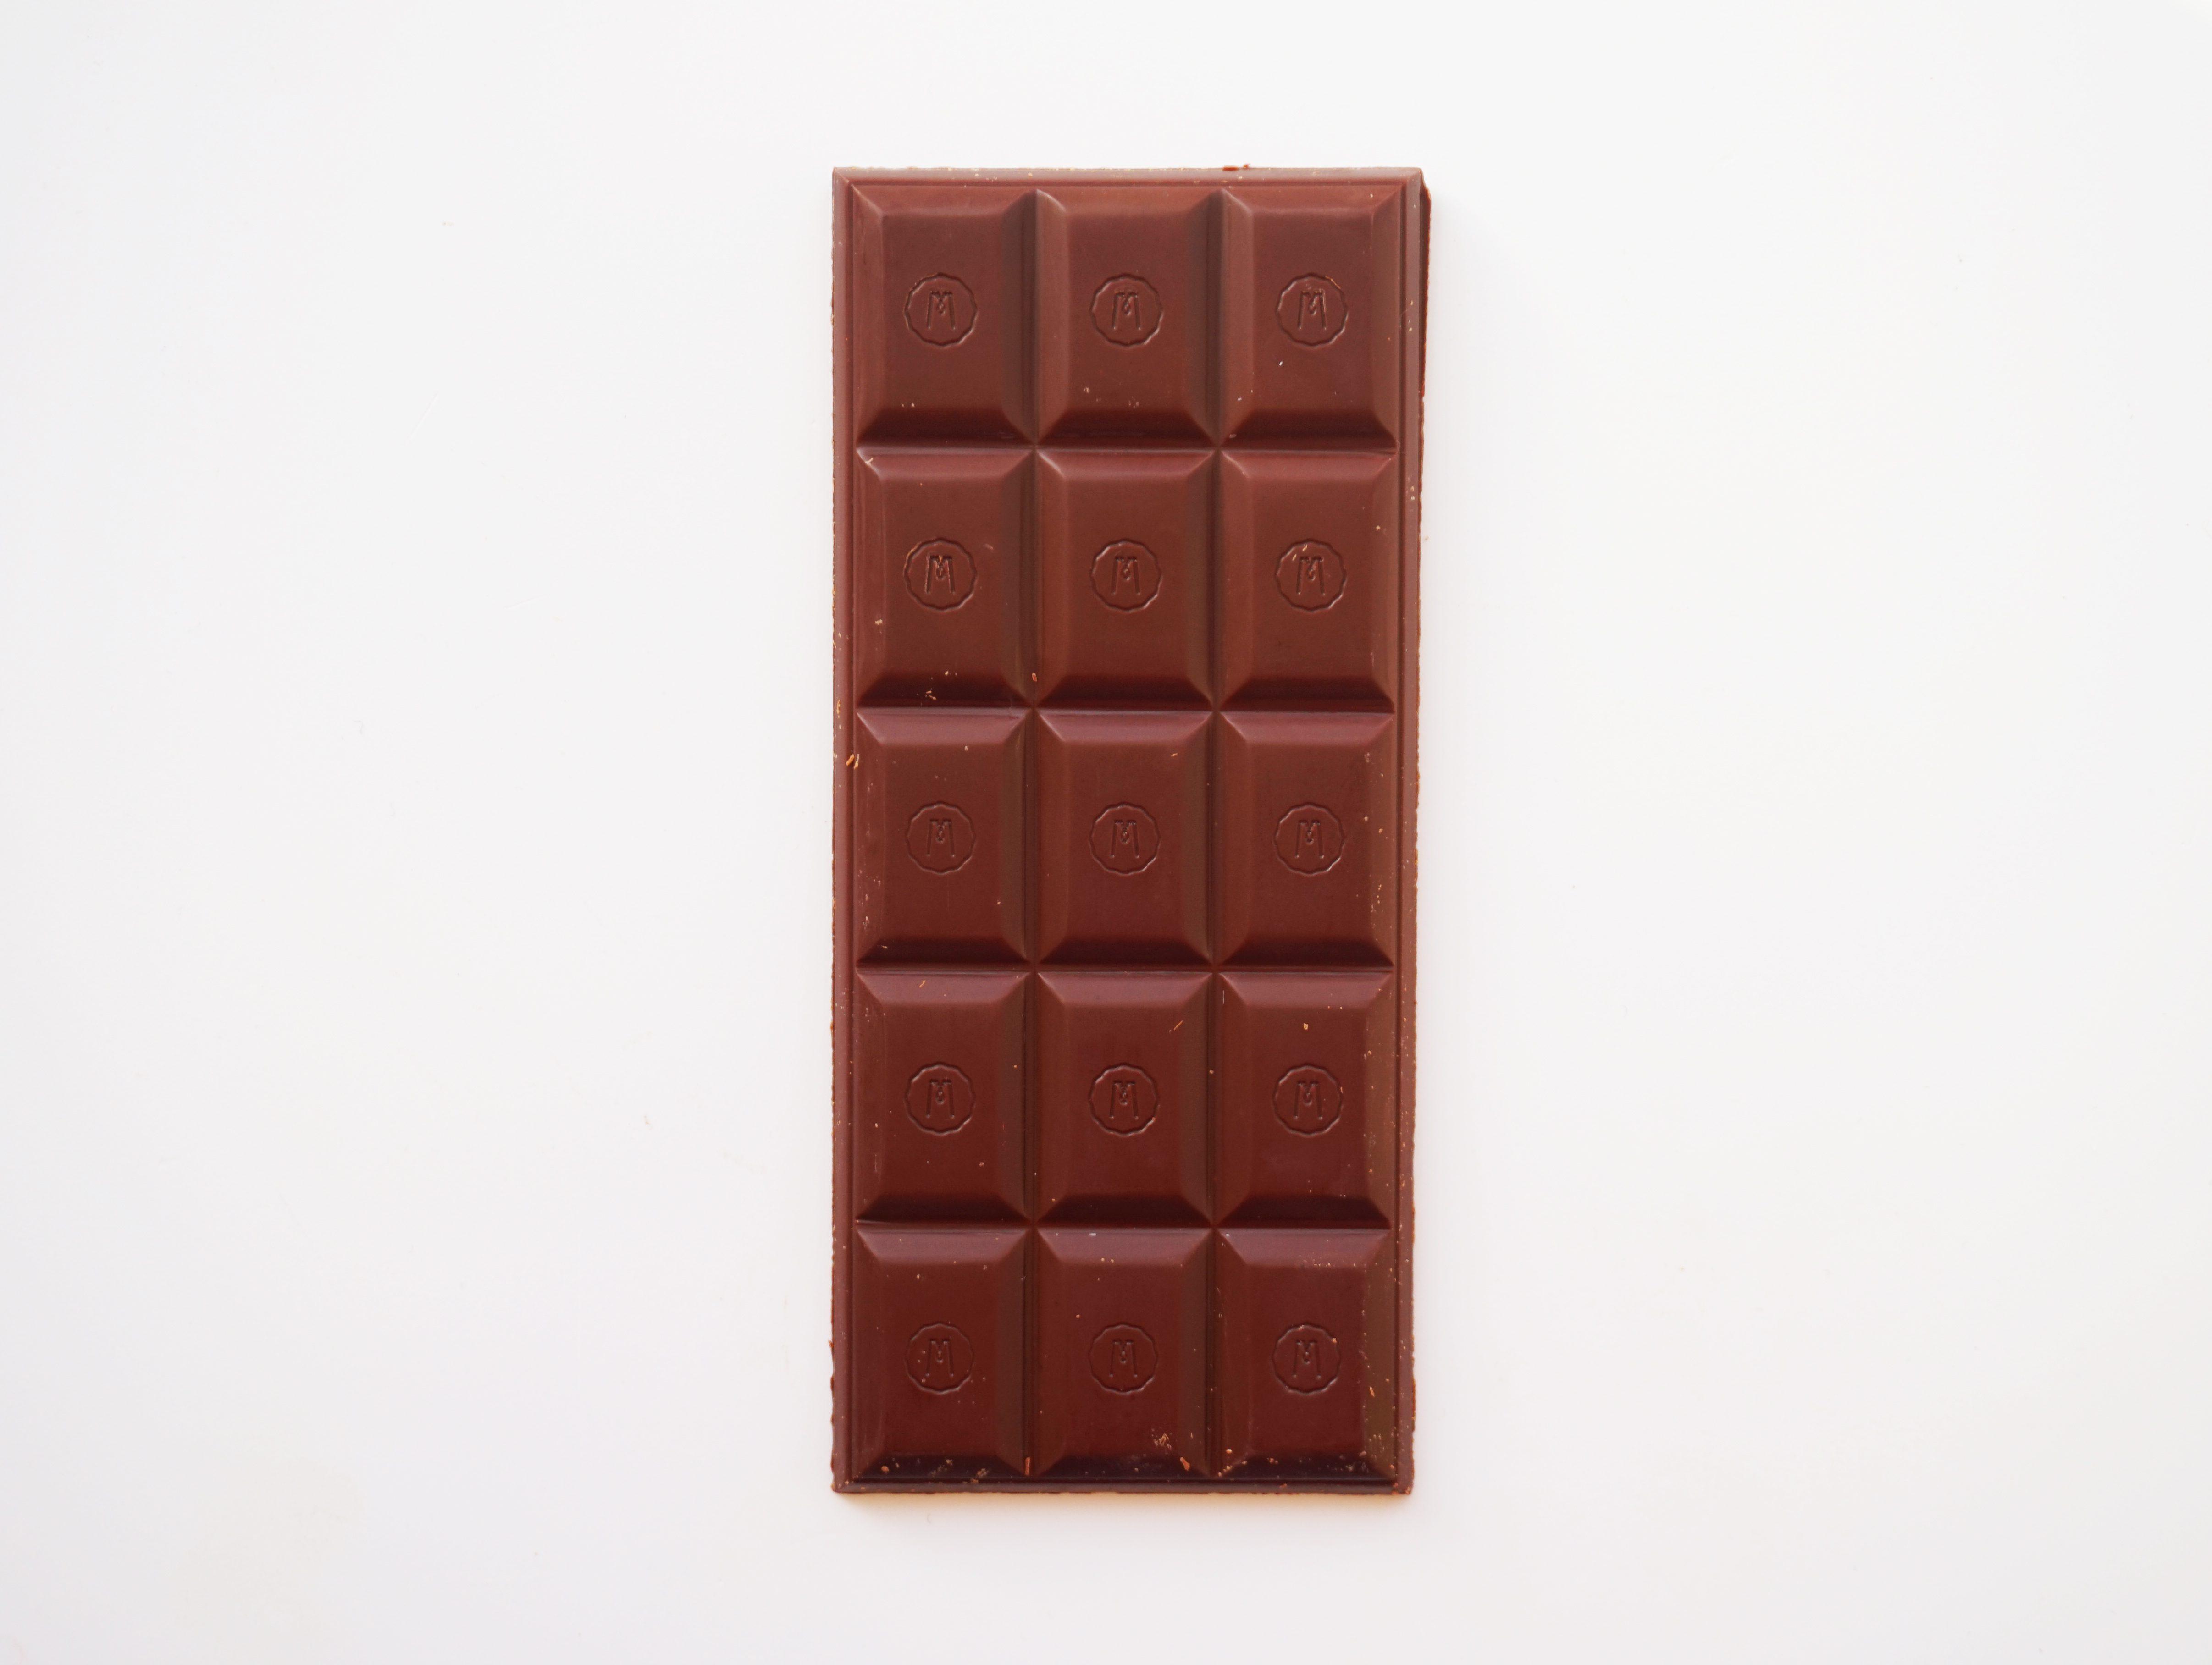 Chocolat Noir Marana – Cusco 70% de cacao